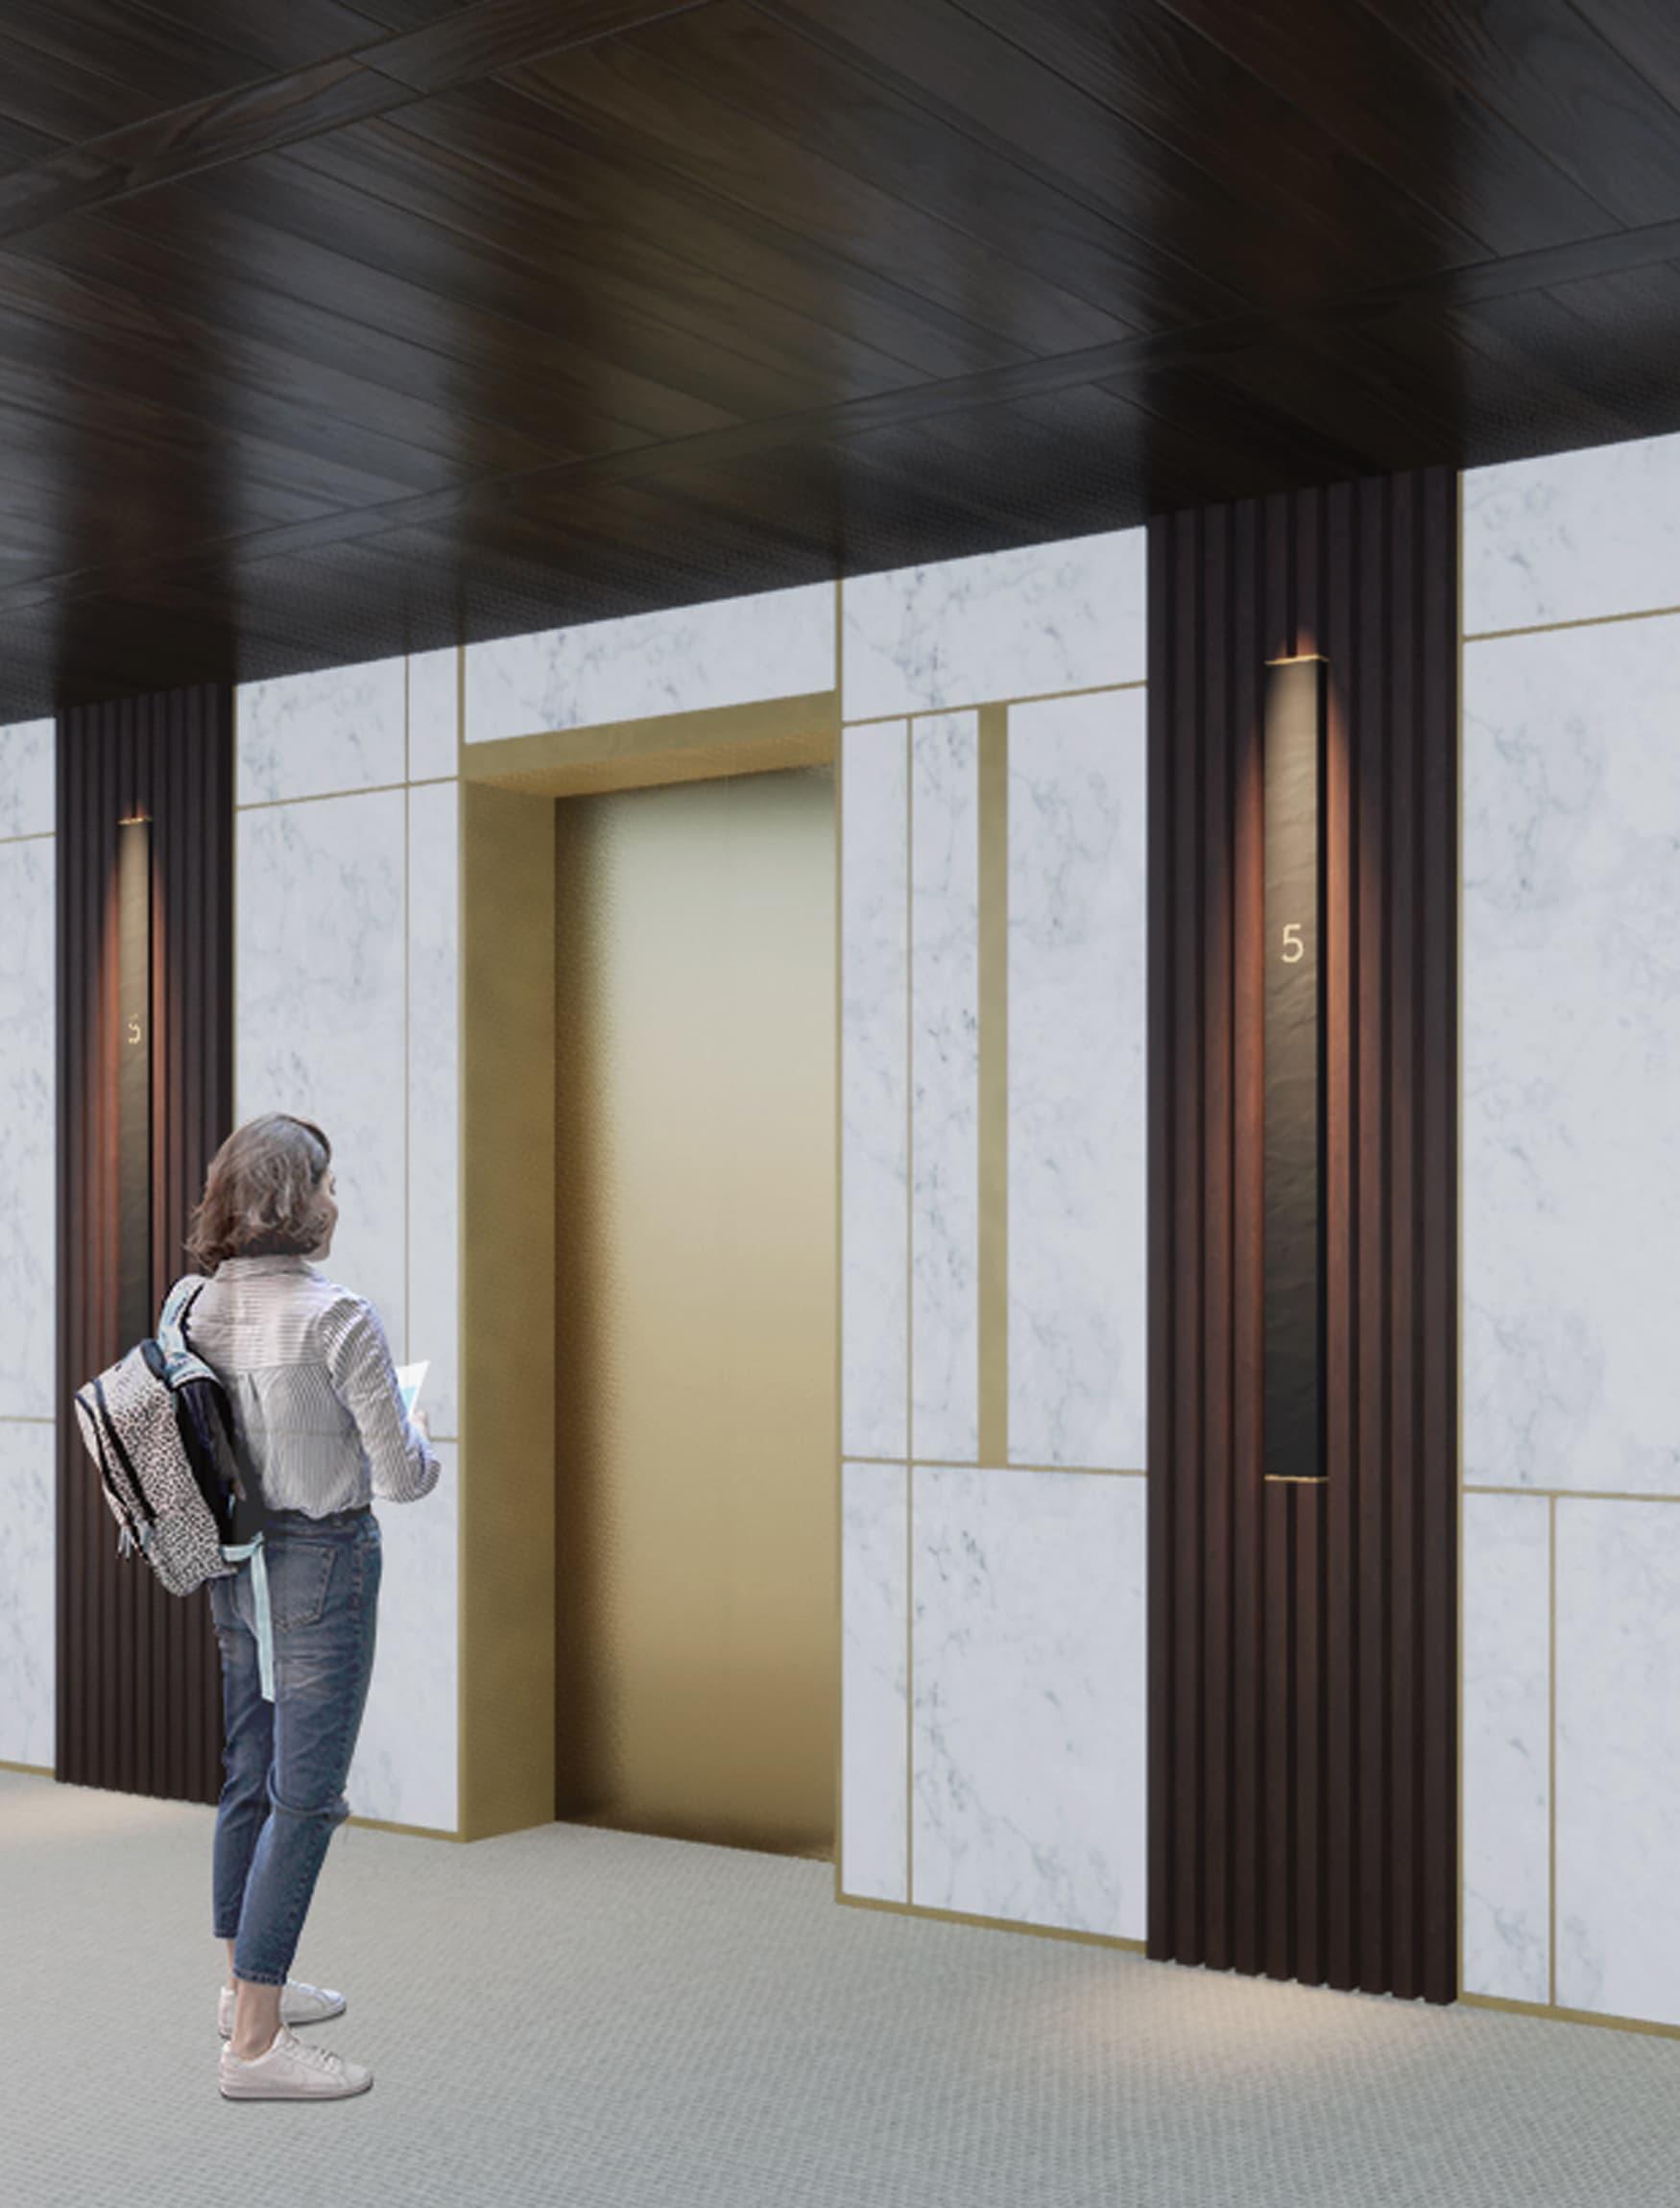 Viceroy Hotel and Resorts in Minsk, Belarus. Hospitality Design. Elevator Floor Level Identity Sign.